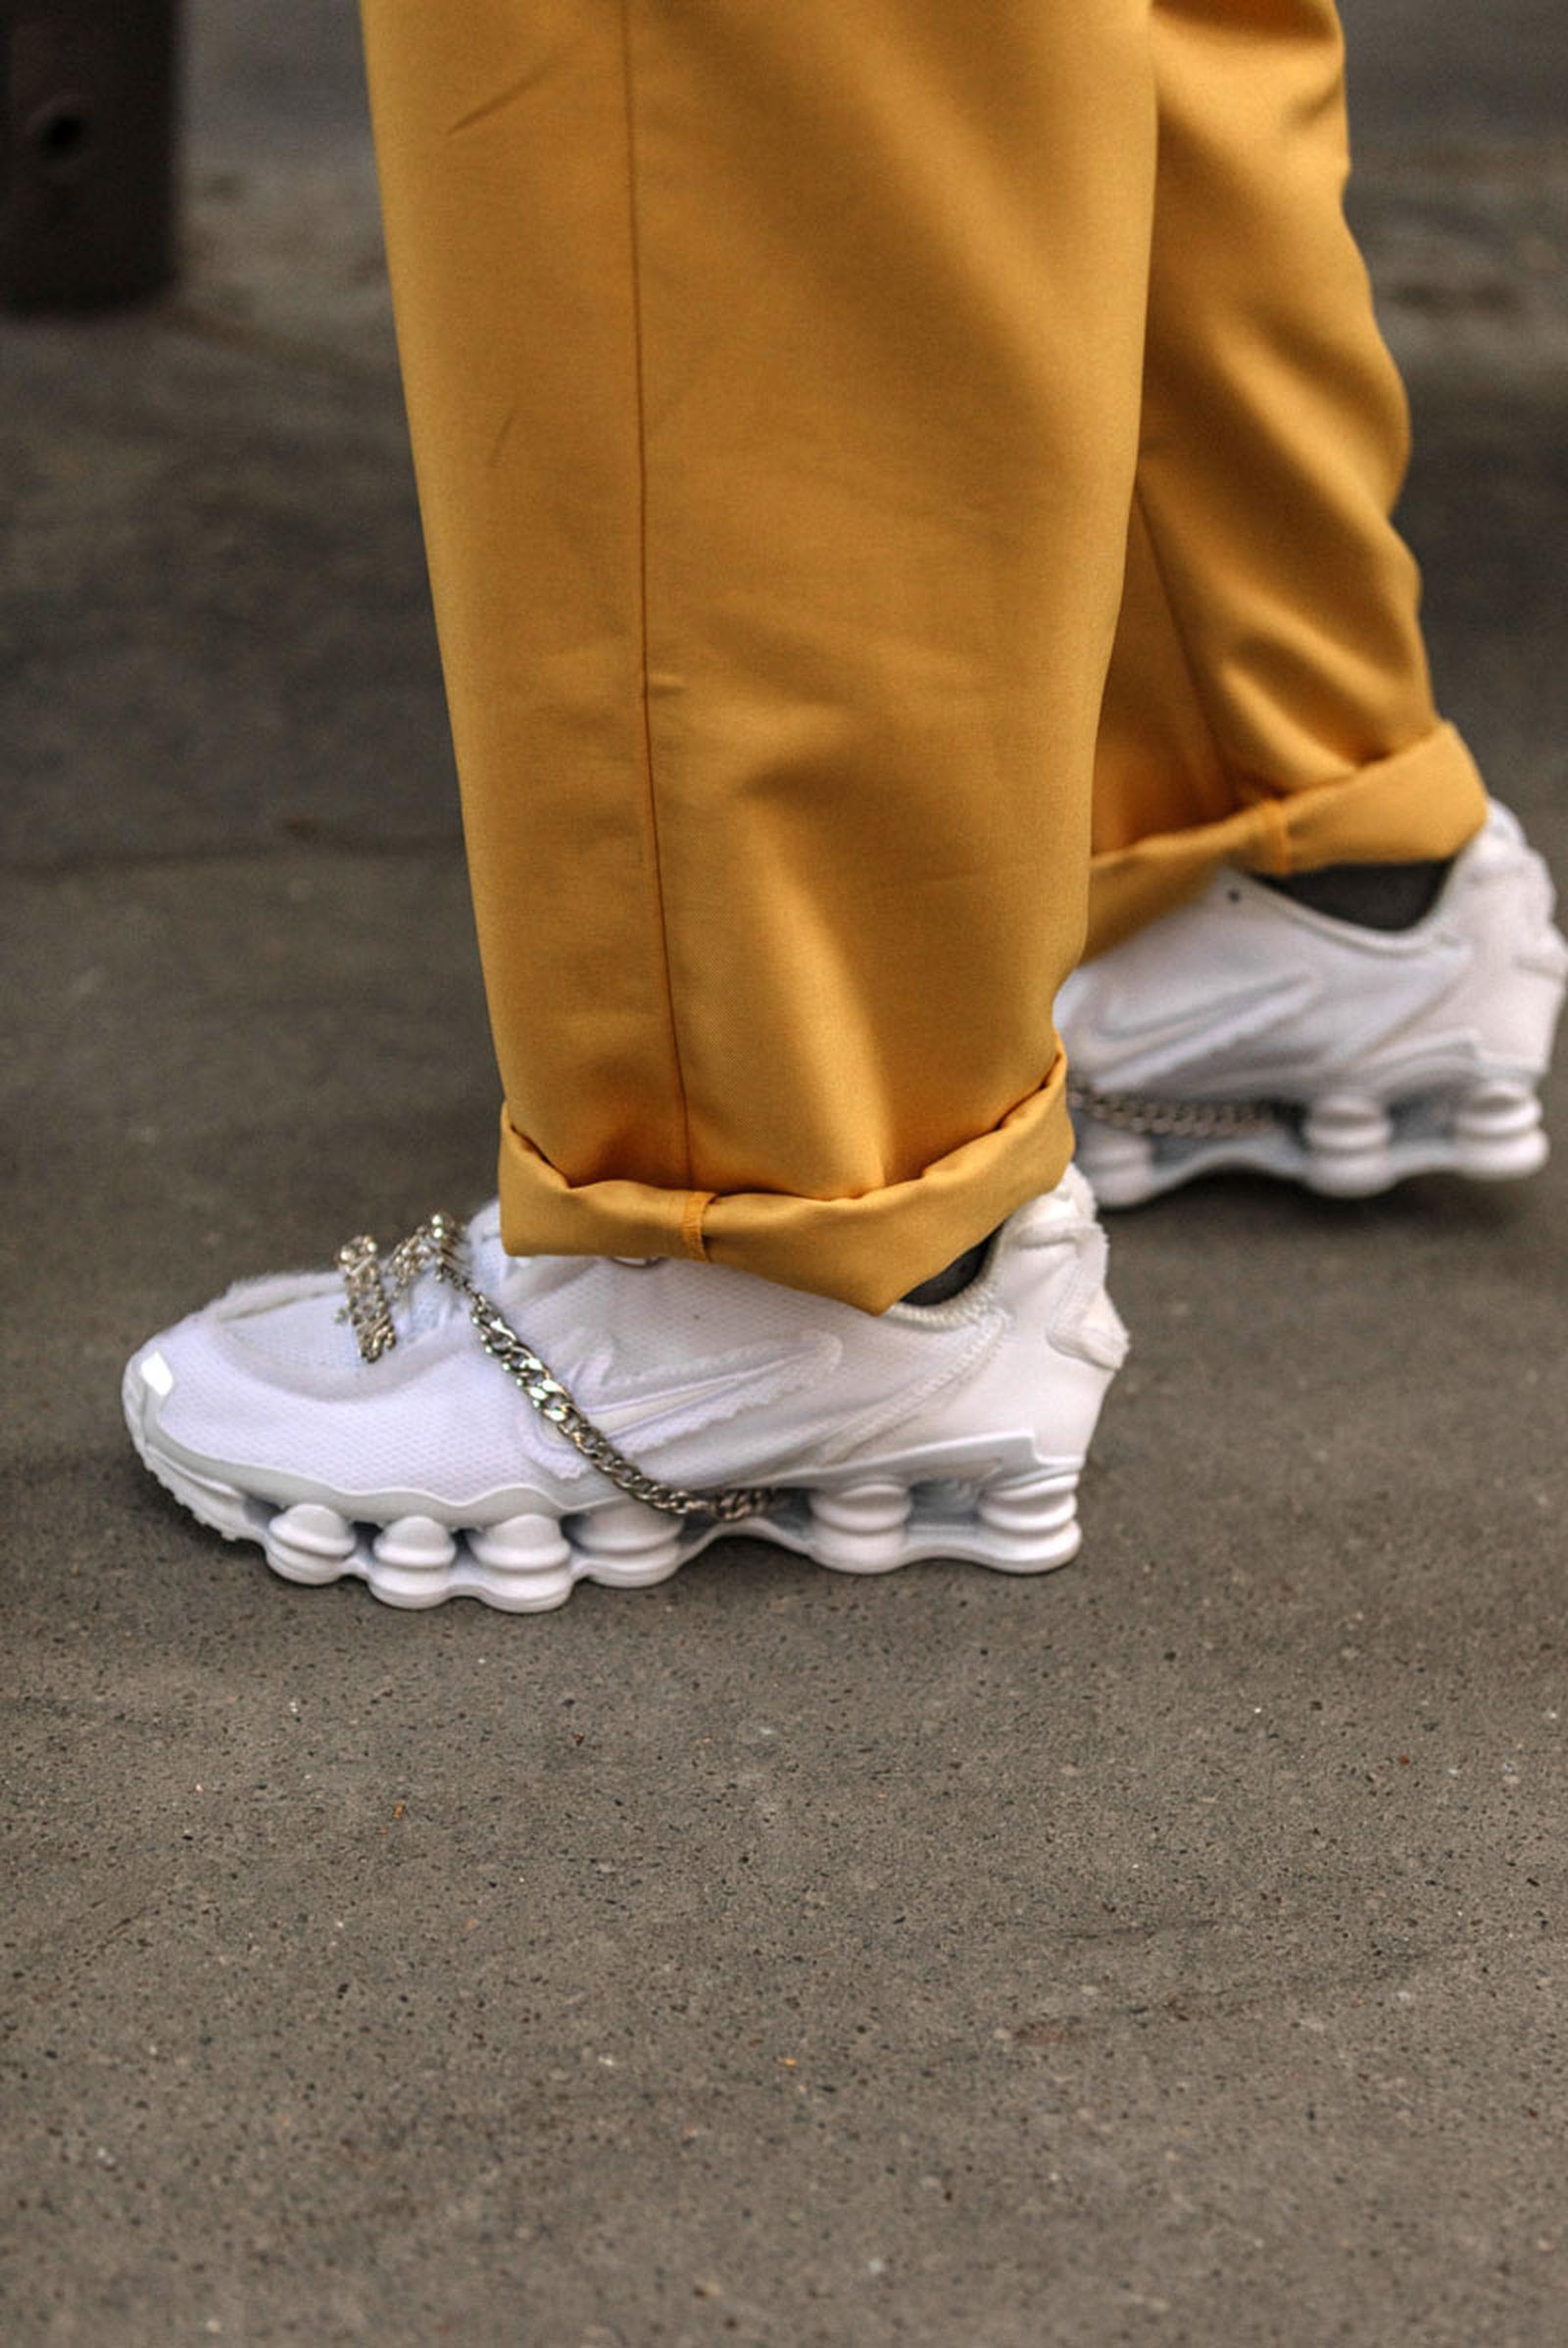 paris fashion week ss20 sneakers 019 Nike comme des garcons li ning